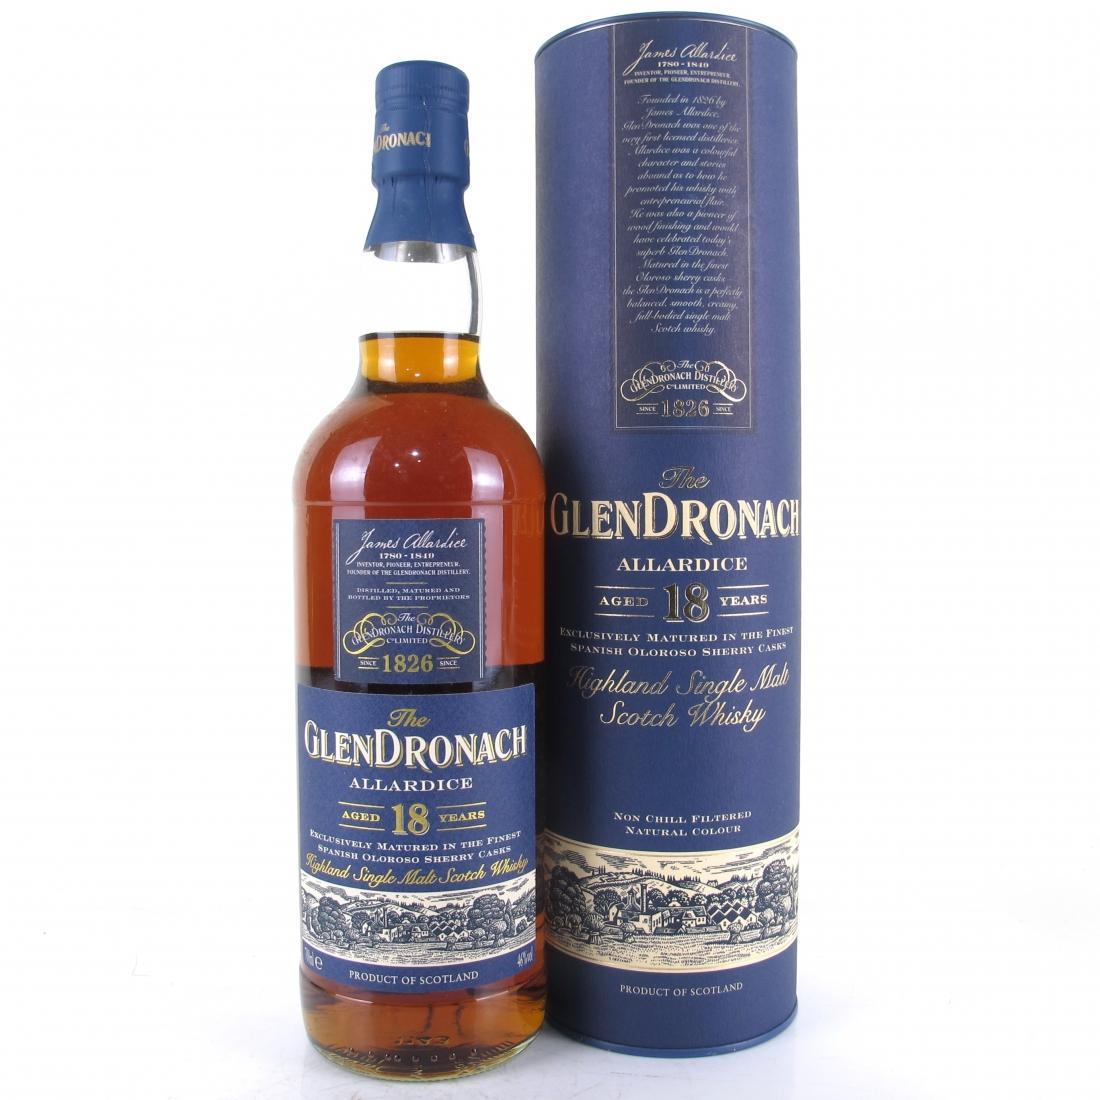 Glendronach 18 Year Old Allardice / Lot #3